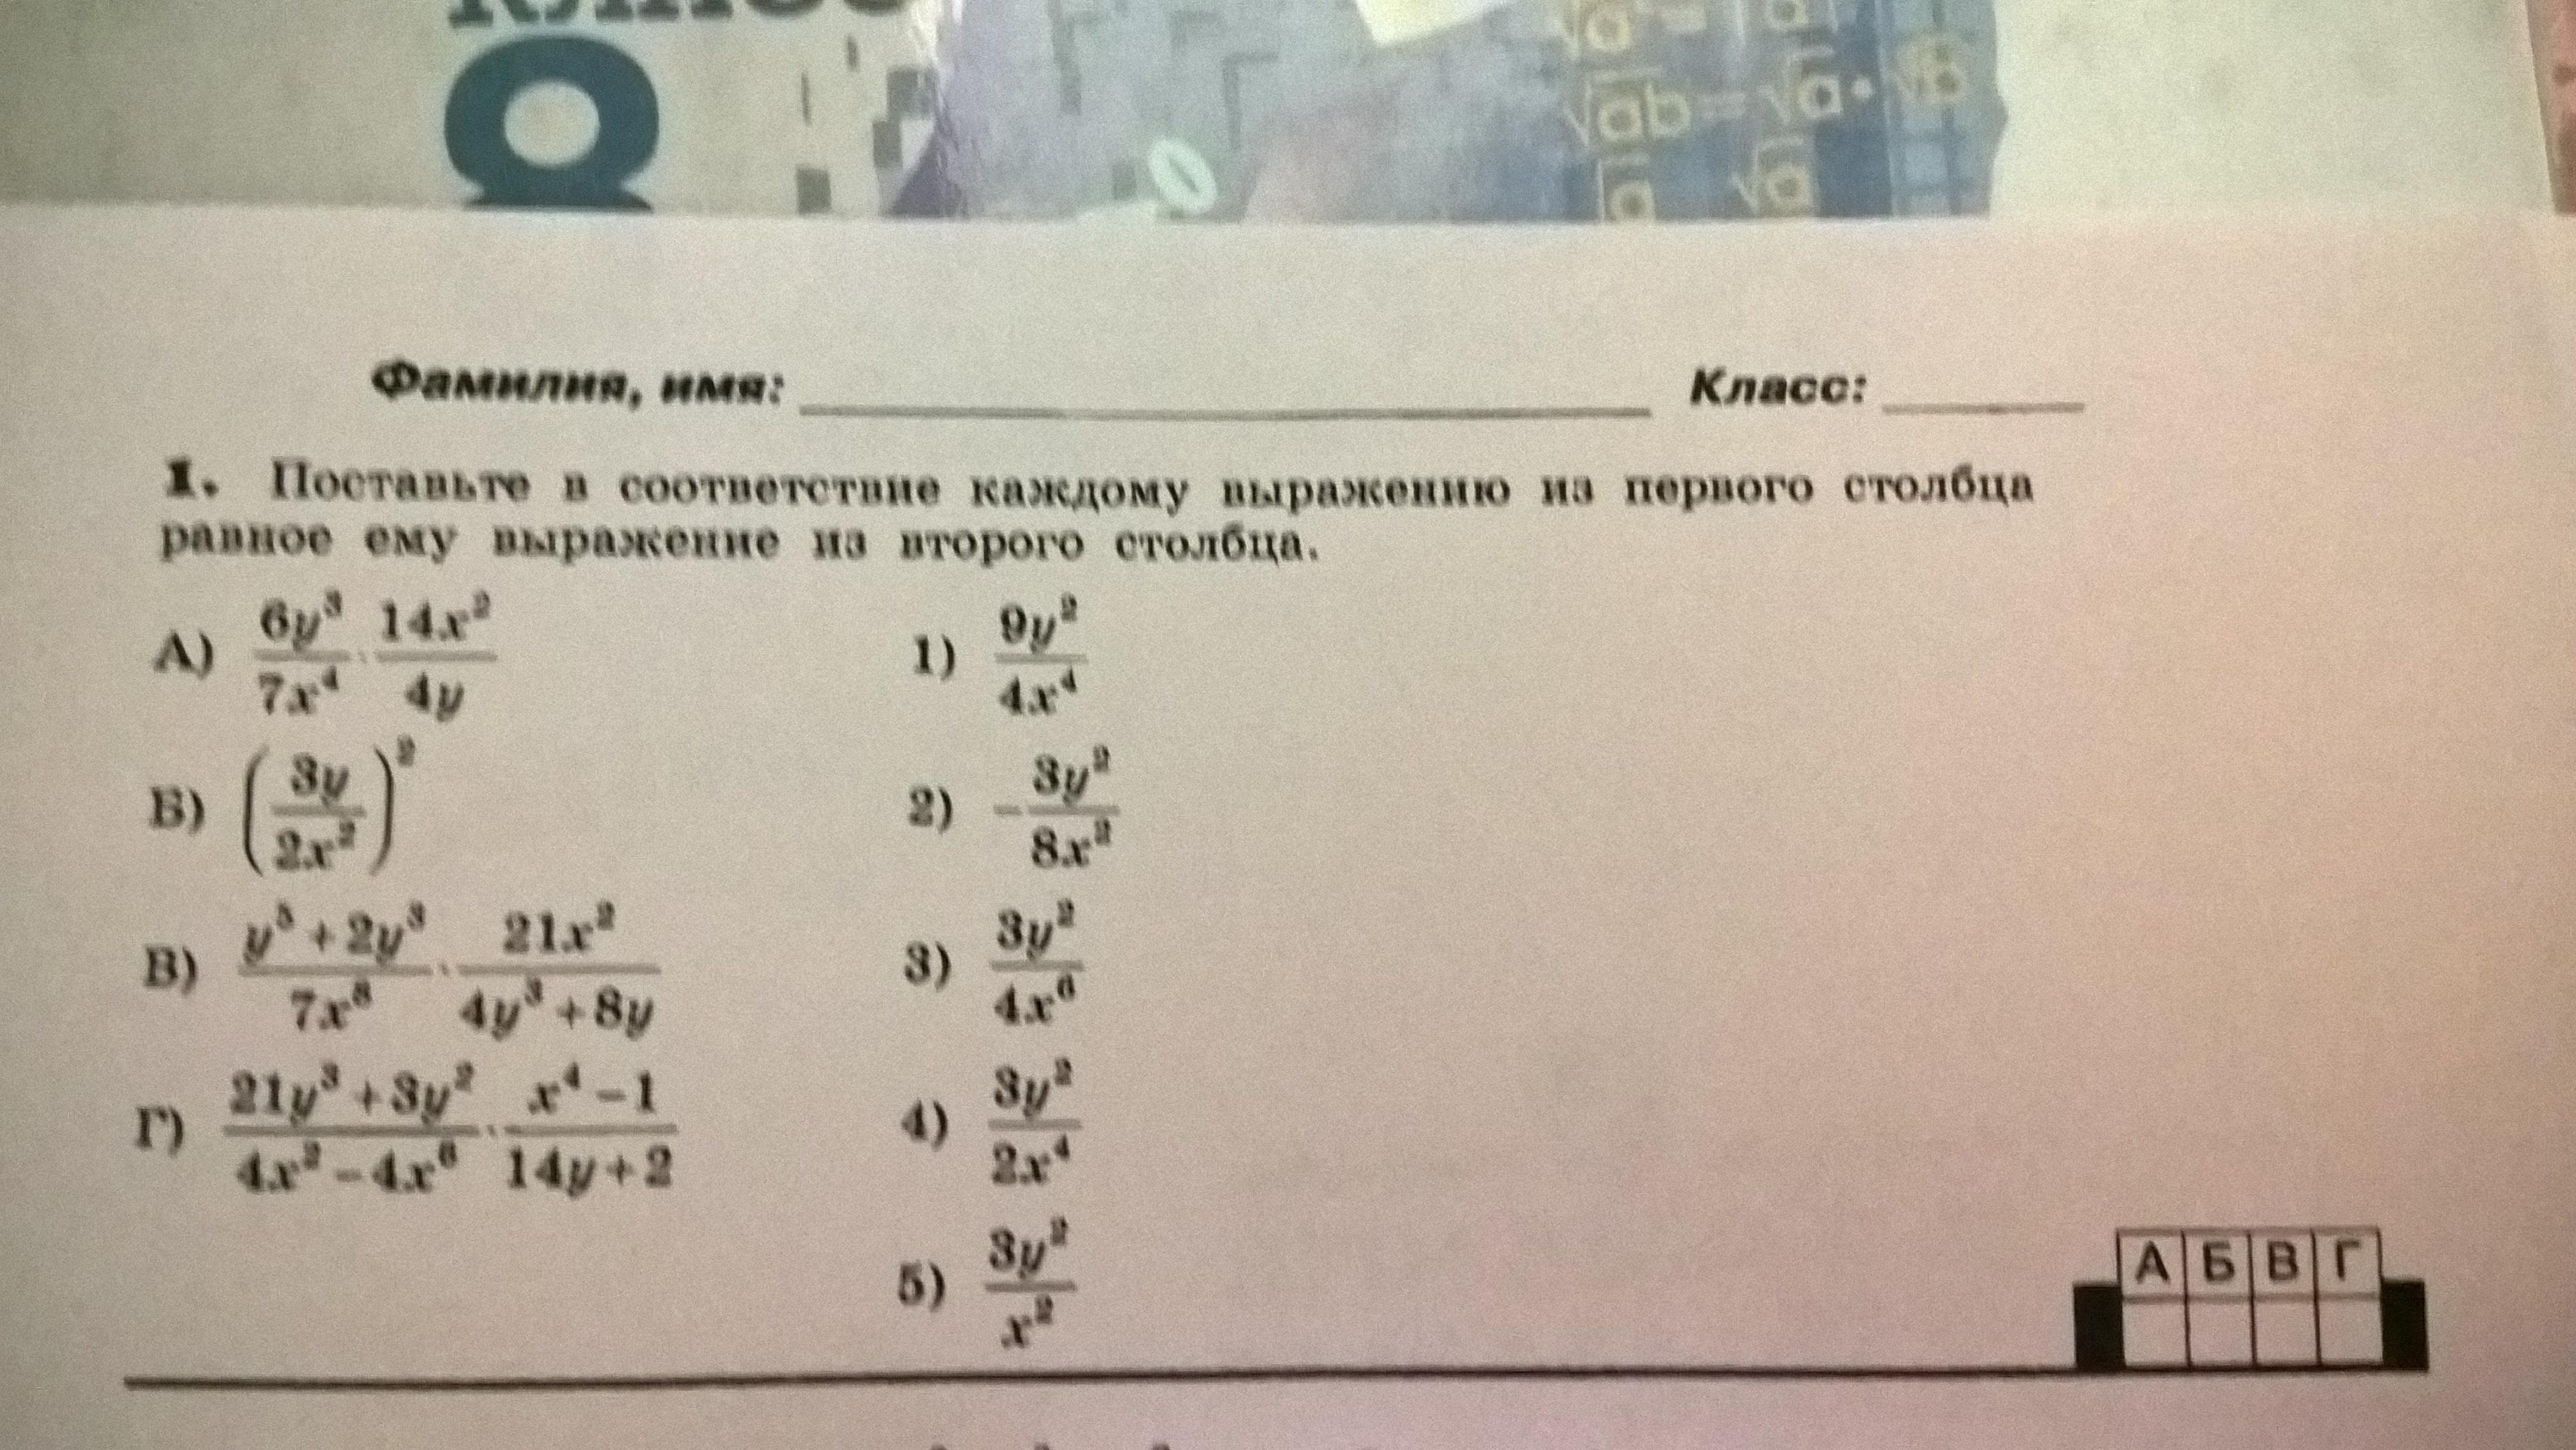 Помогите с алгеброй ребят,плииииииииз